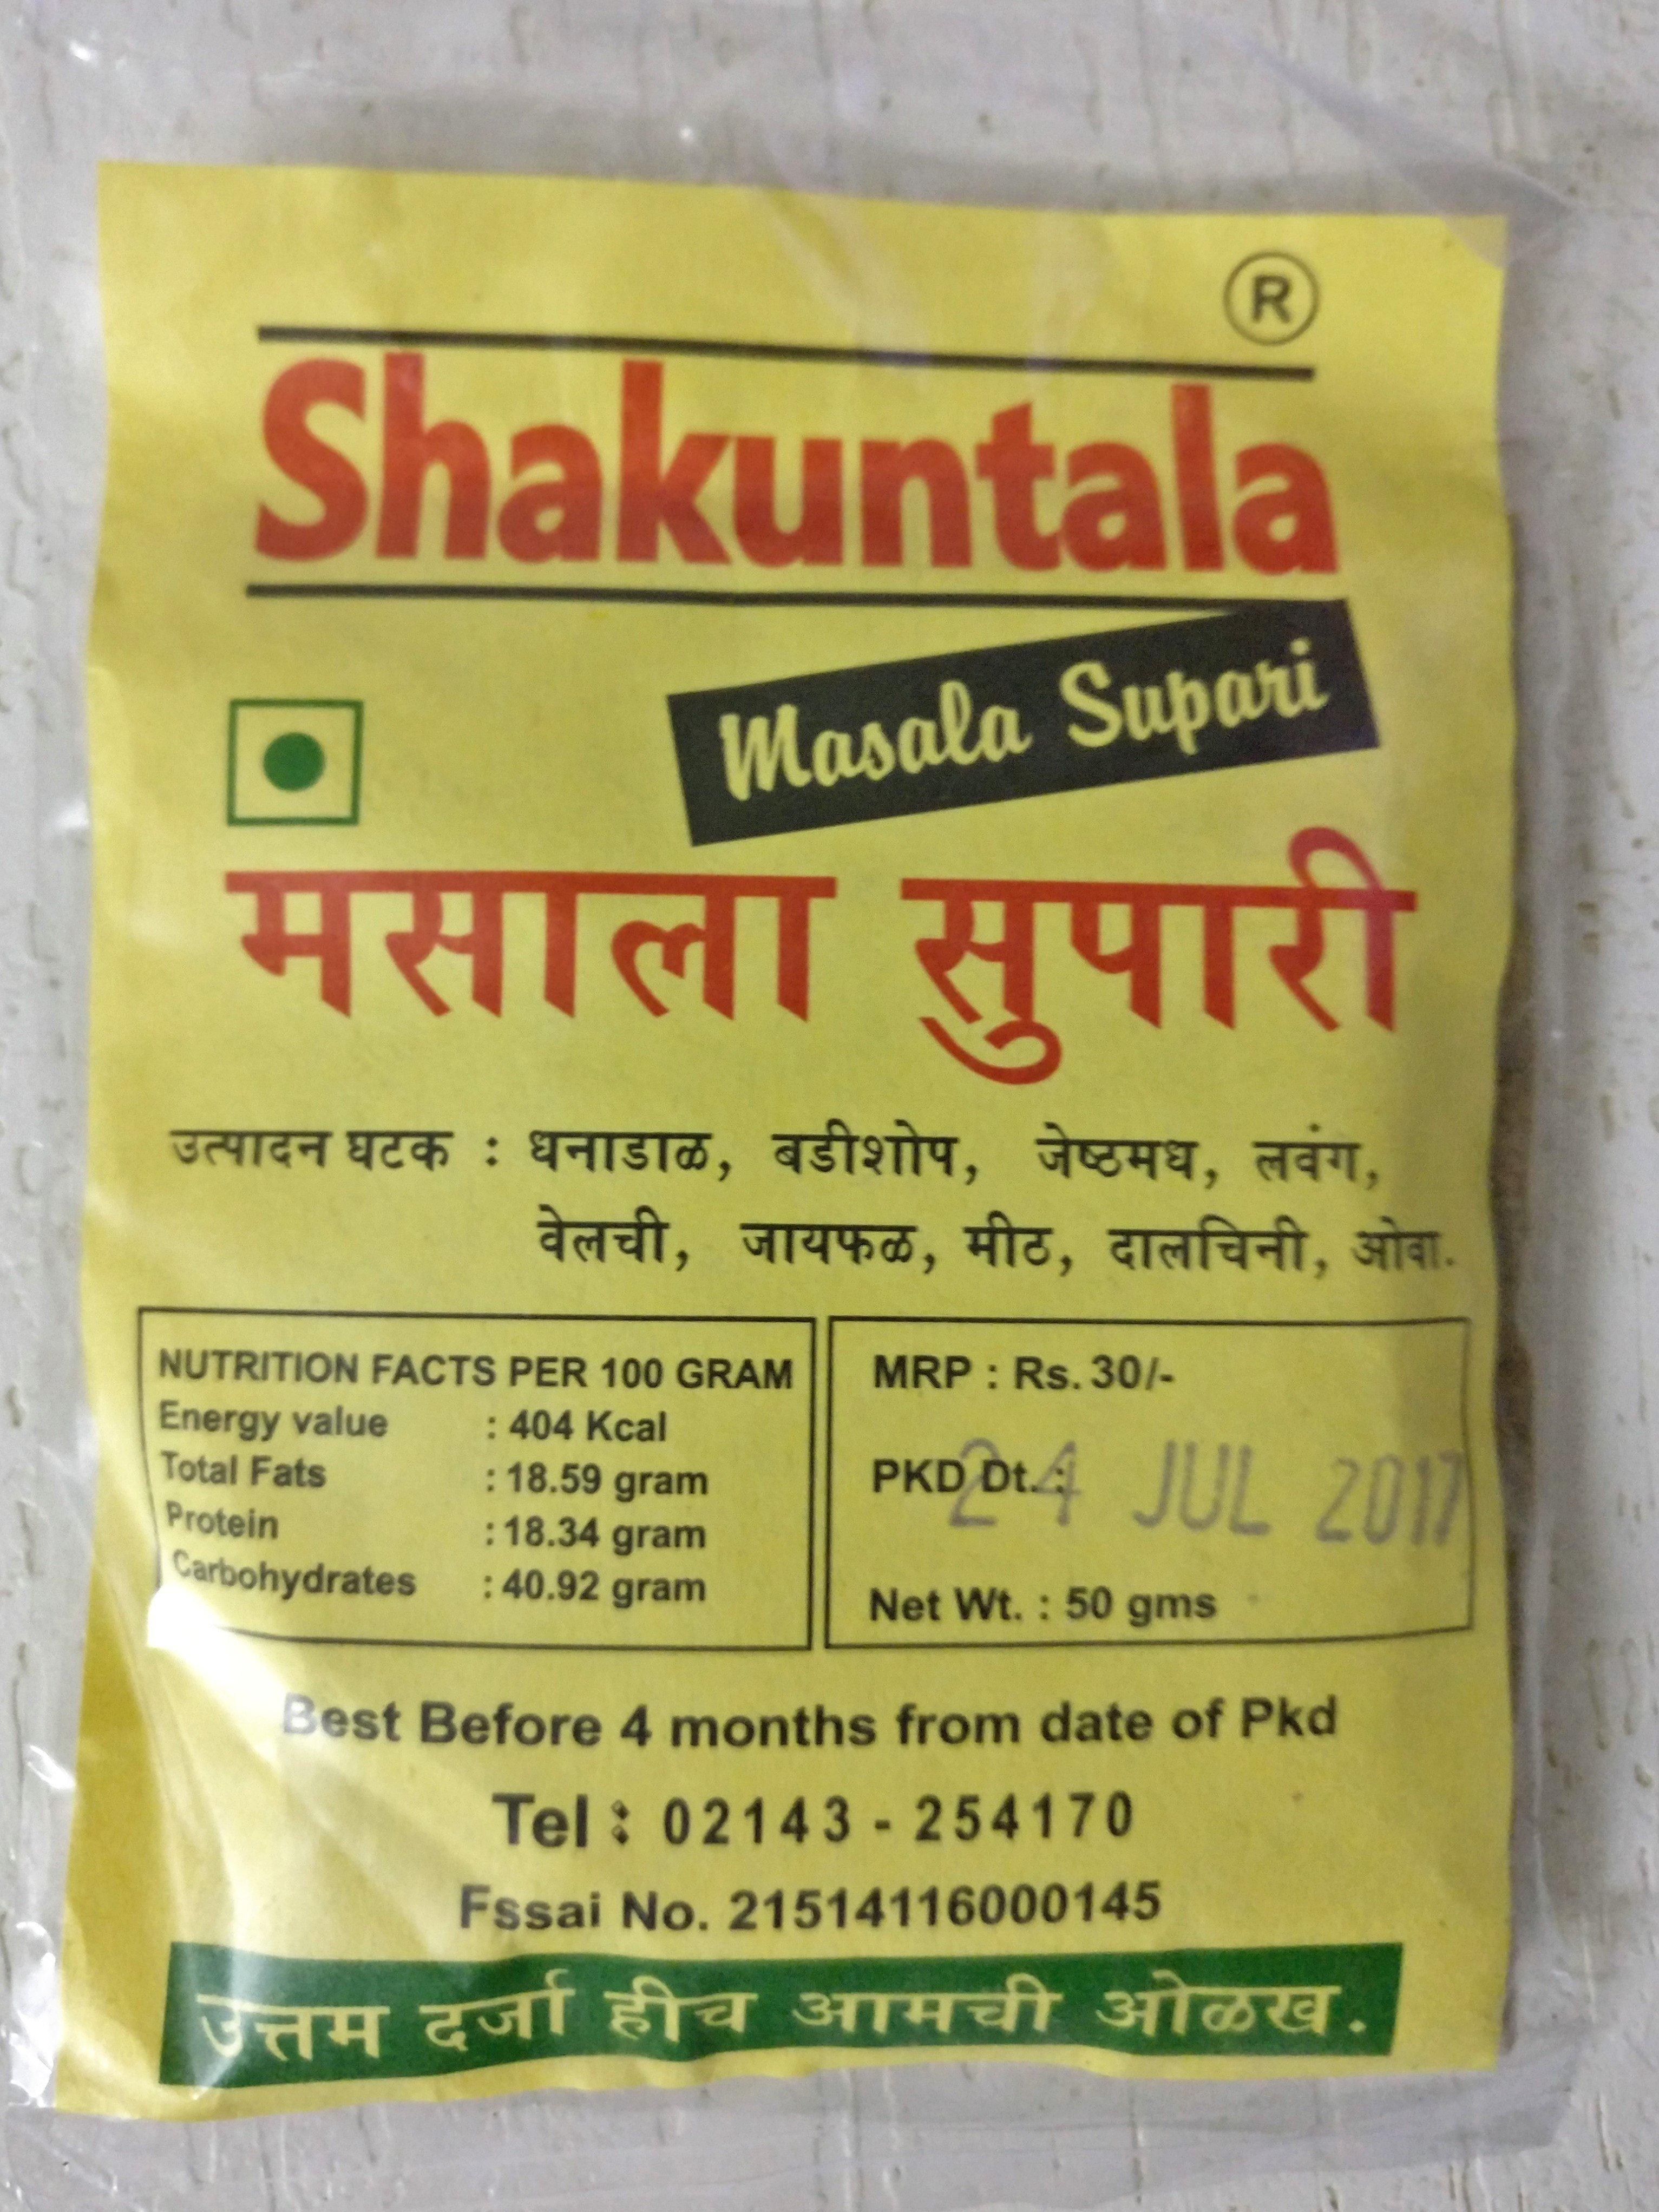 Shakuntala Food Products Masala Mukhwas